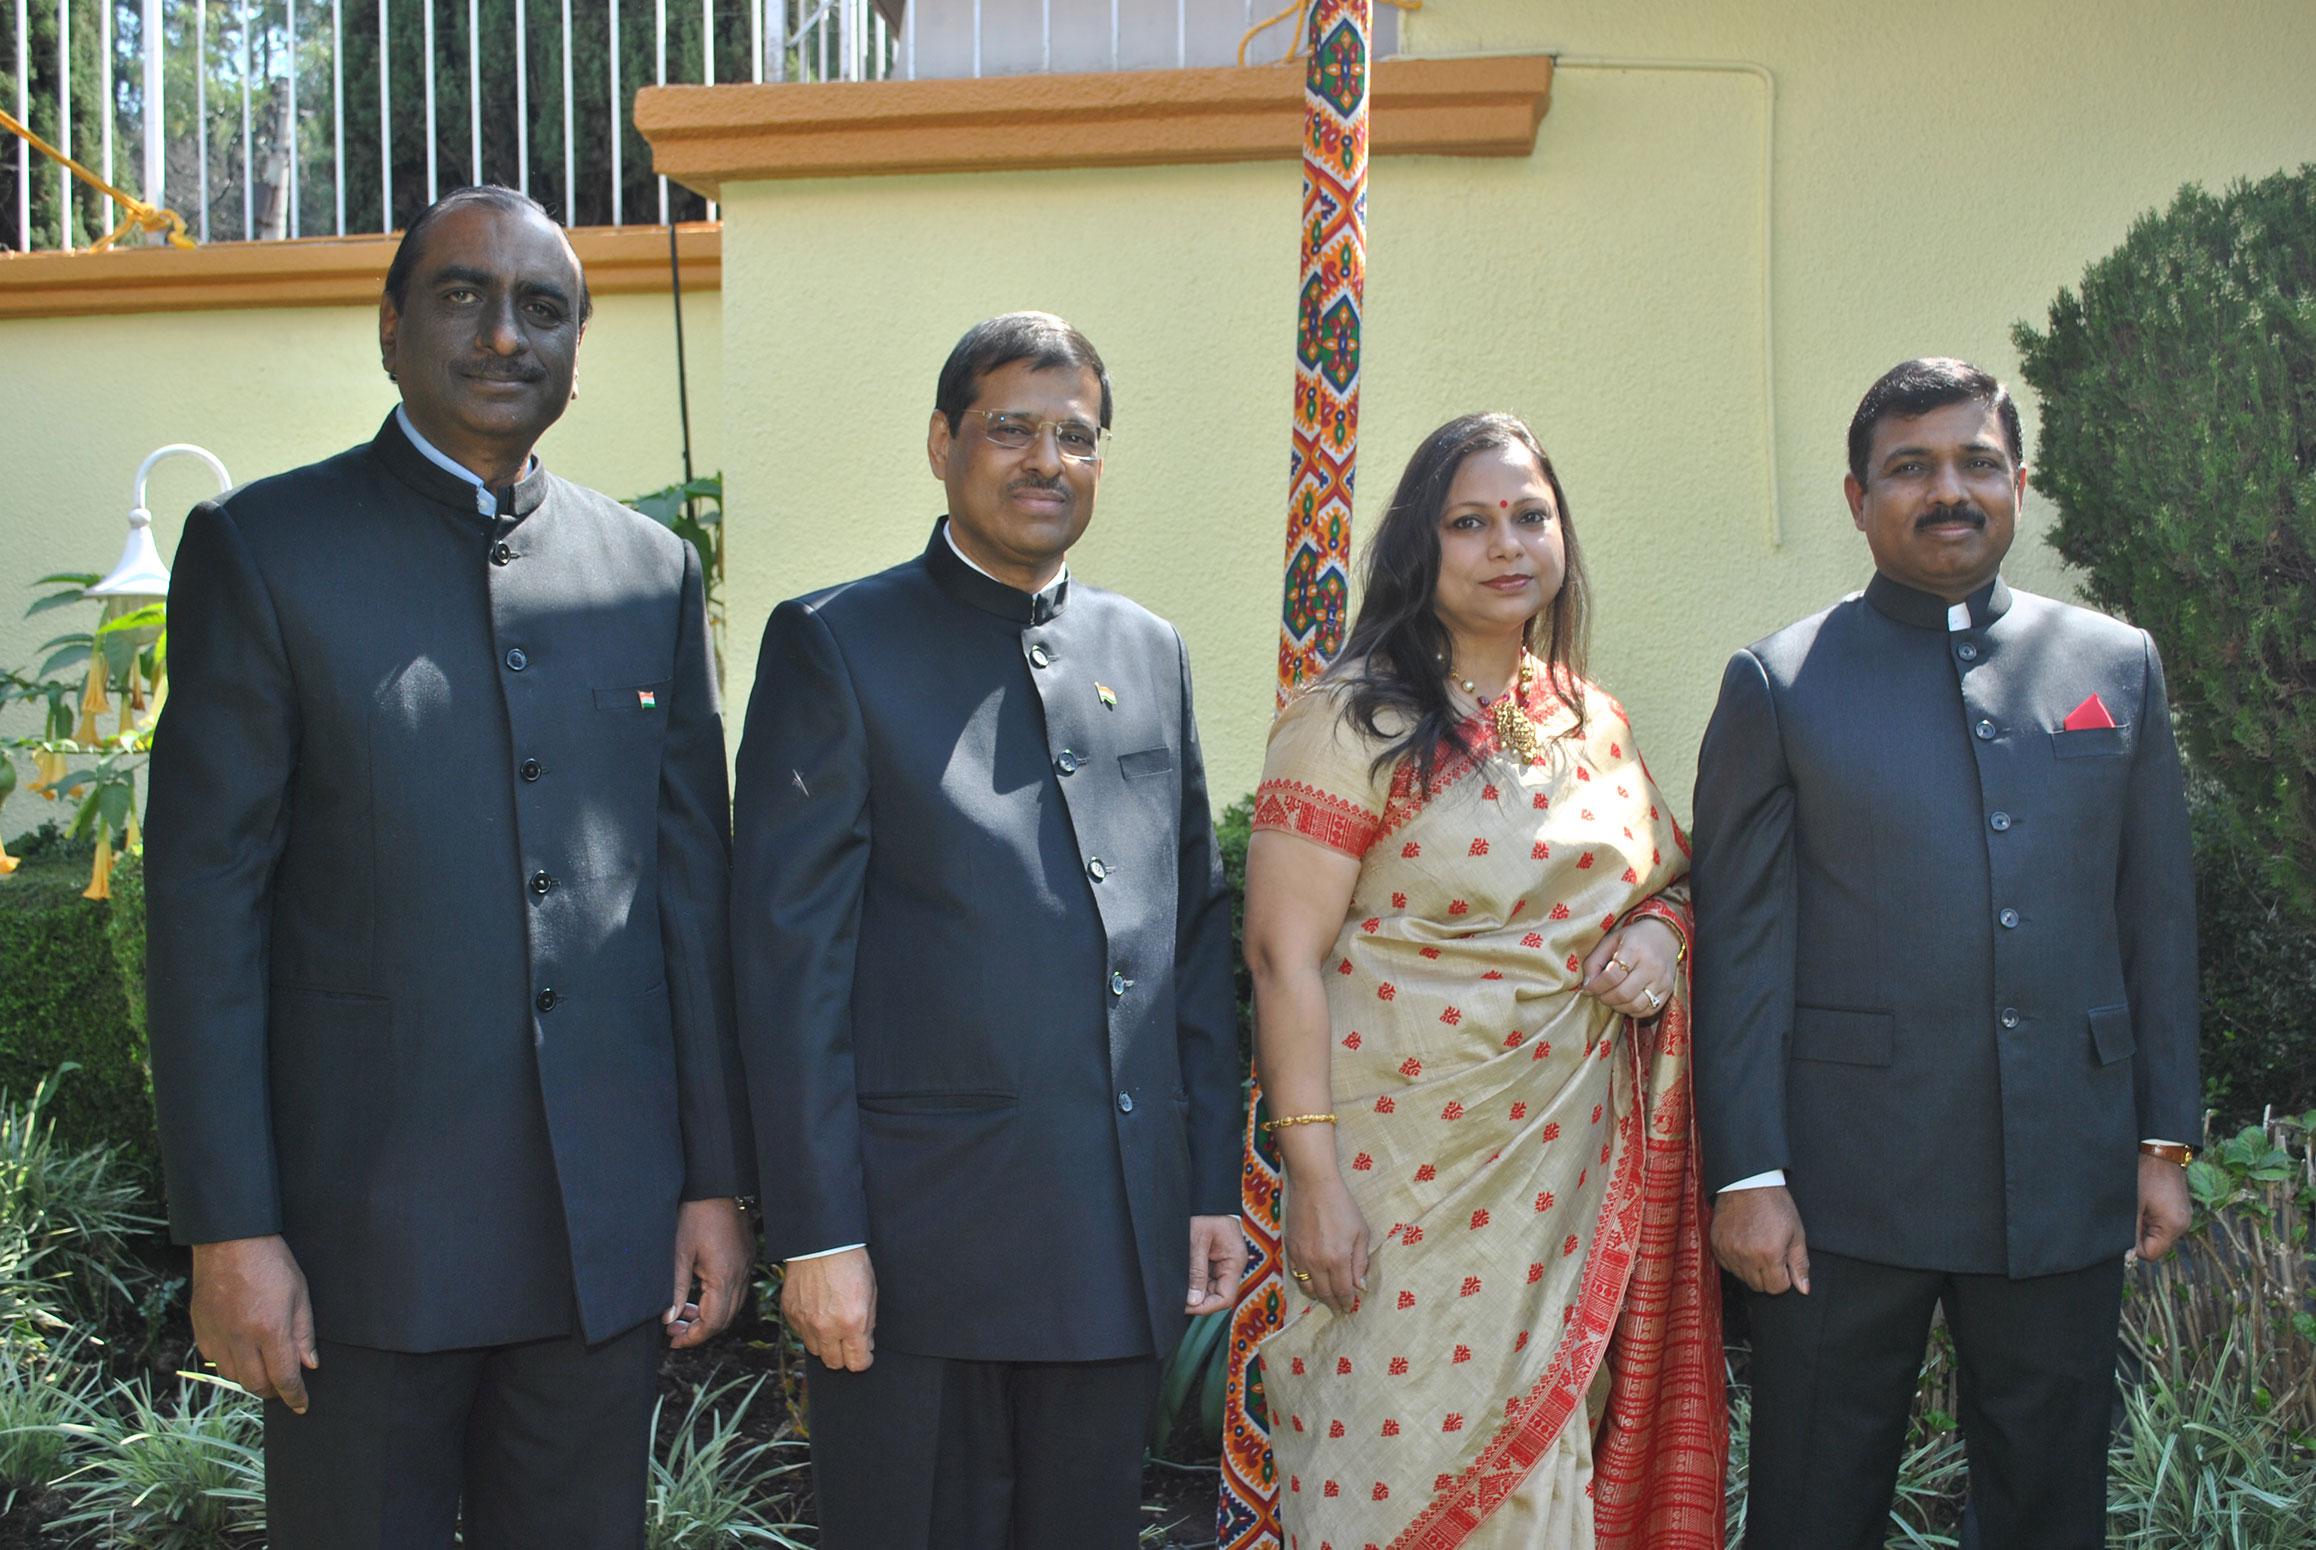 M. R. Quereshi, Asutosh Kumar Agrawal, Rakhi Pardeshi y su esposo, Muktesh Pardeshi, embajador de la India